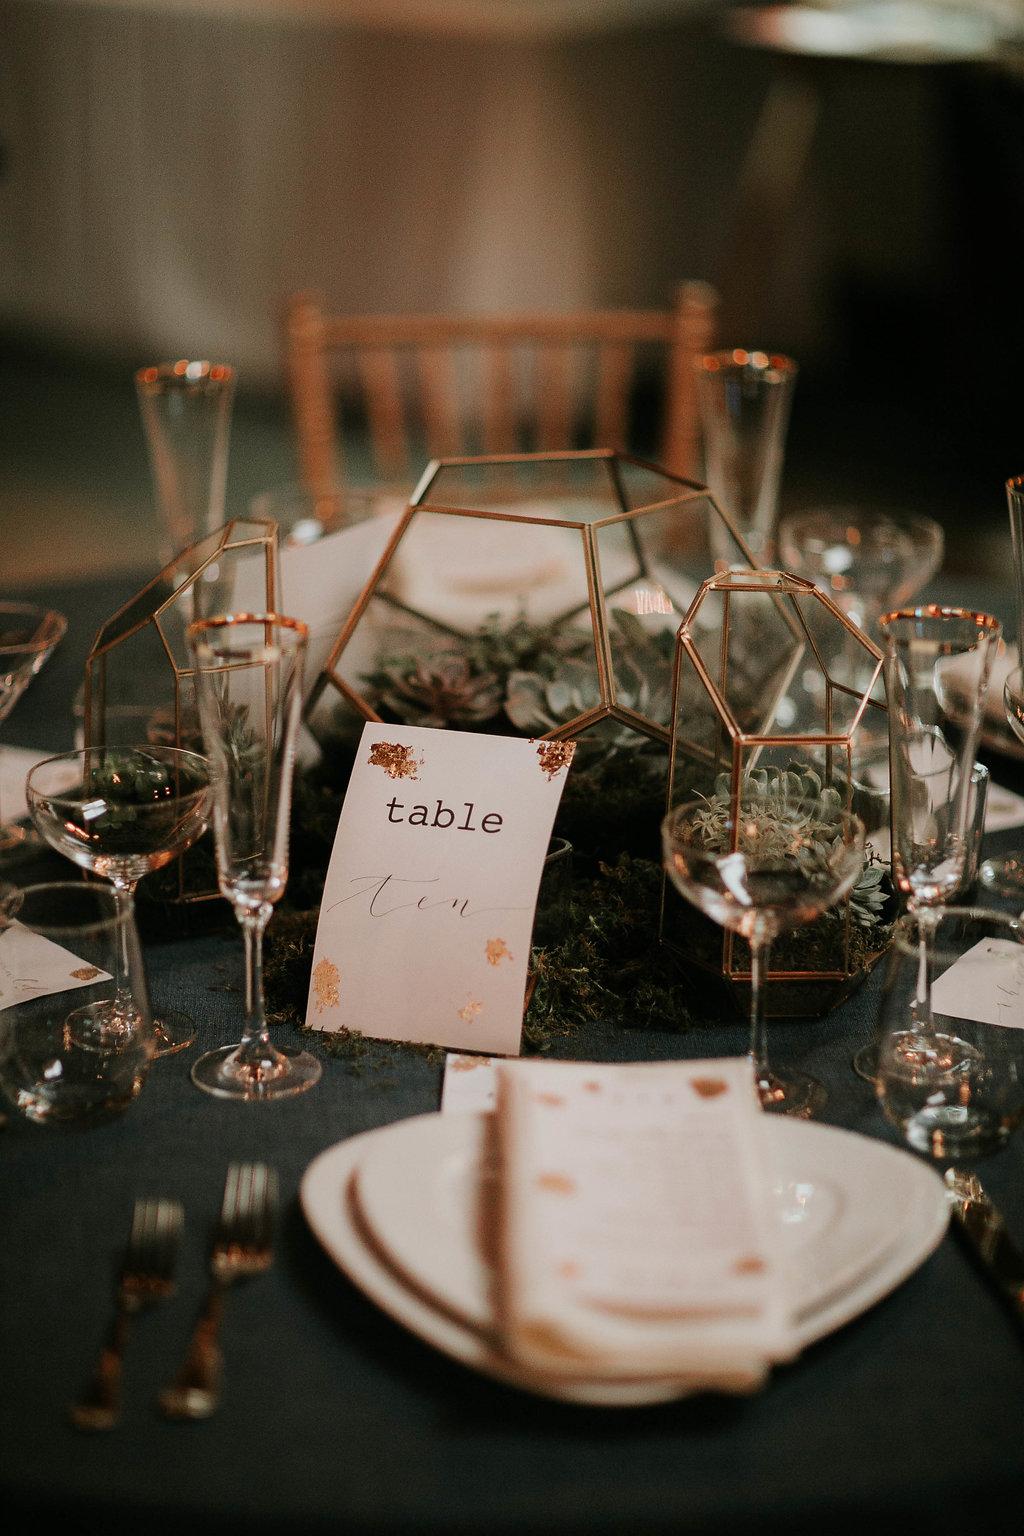 The_Big_Fake_wedding_Seattle_Within_sodo_wedding_by_Adina_Preston_Weddings_310.JPG